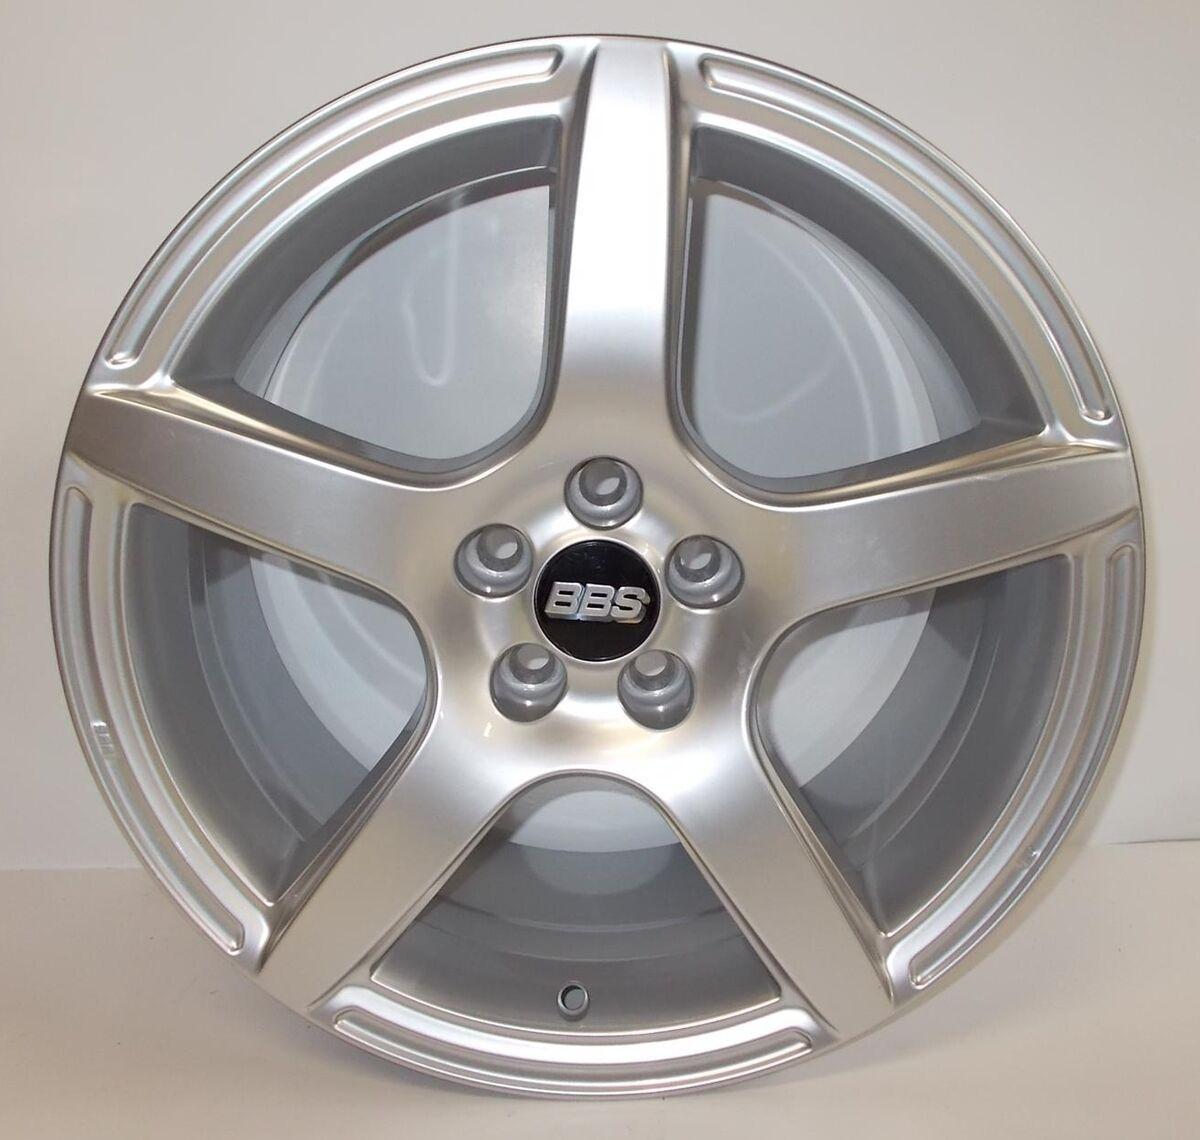 "Single New Sample BBs Wheel Rim 8"" x 17"" 8JX17H2 5x100 VW 5 Spoke w Center Cap"